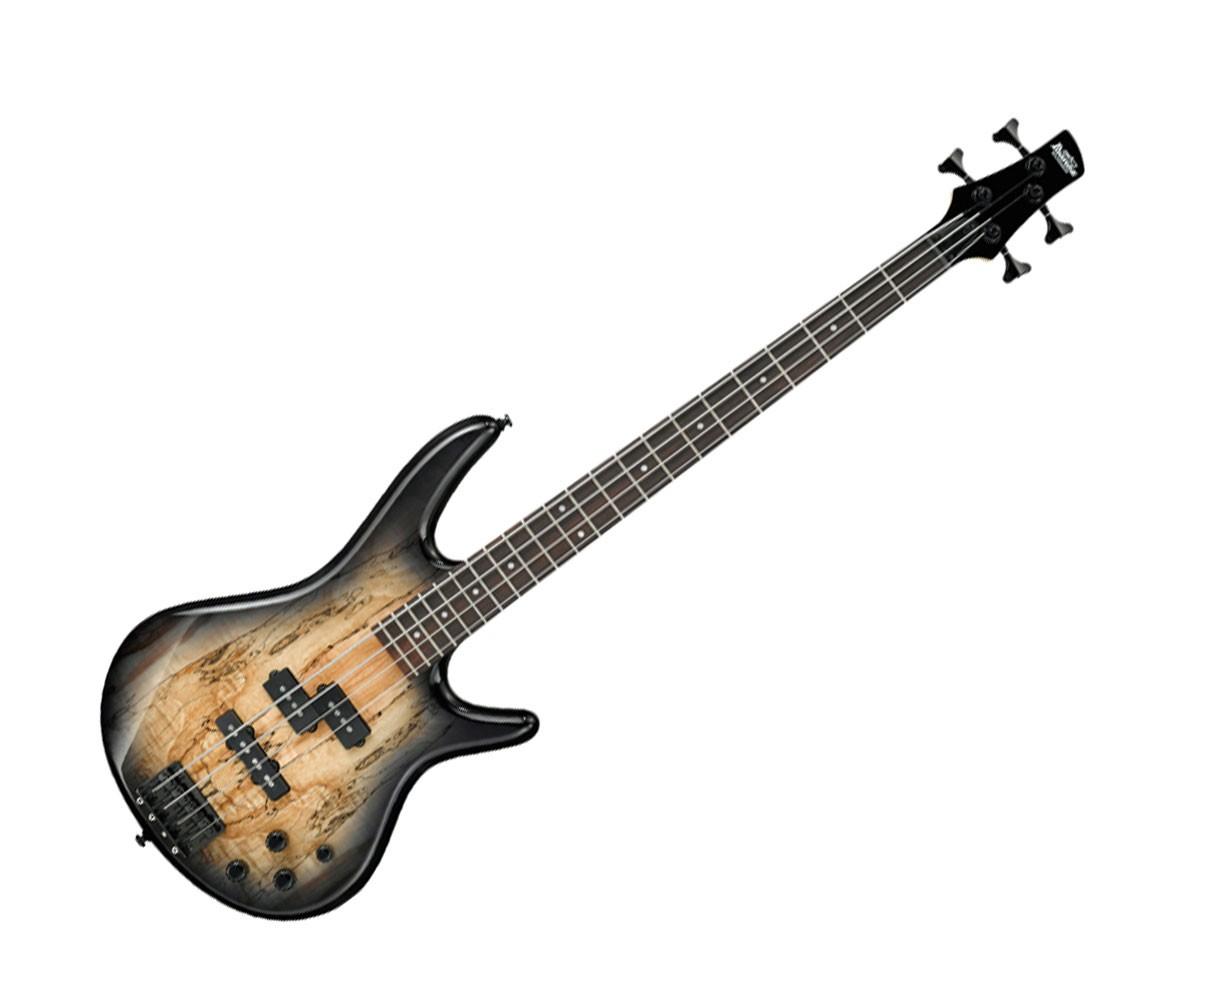 Ibanez GSR200SM Electric Bass Guitar - Natural Gray Burst